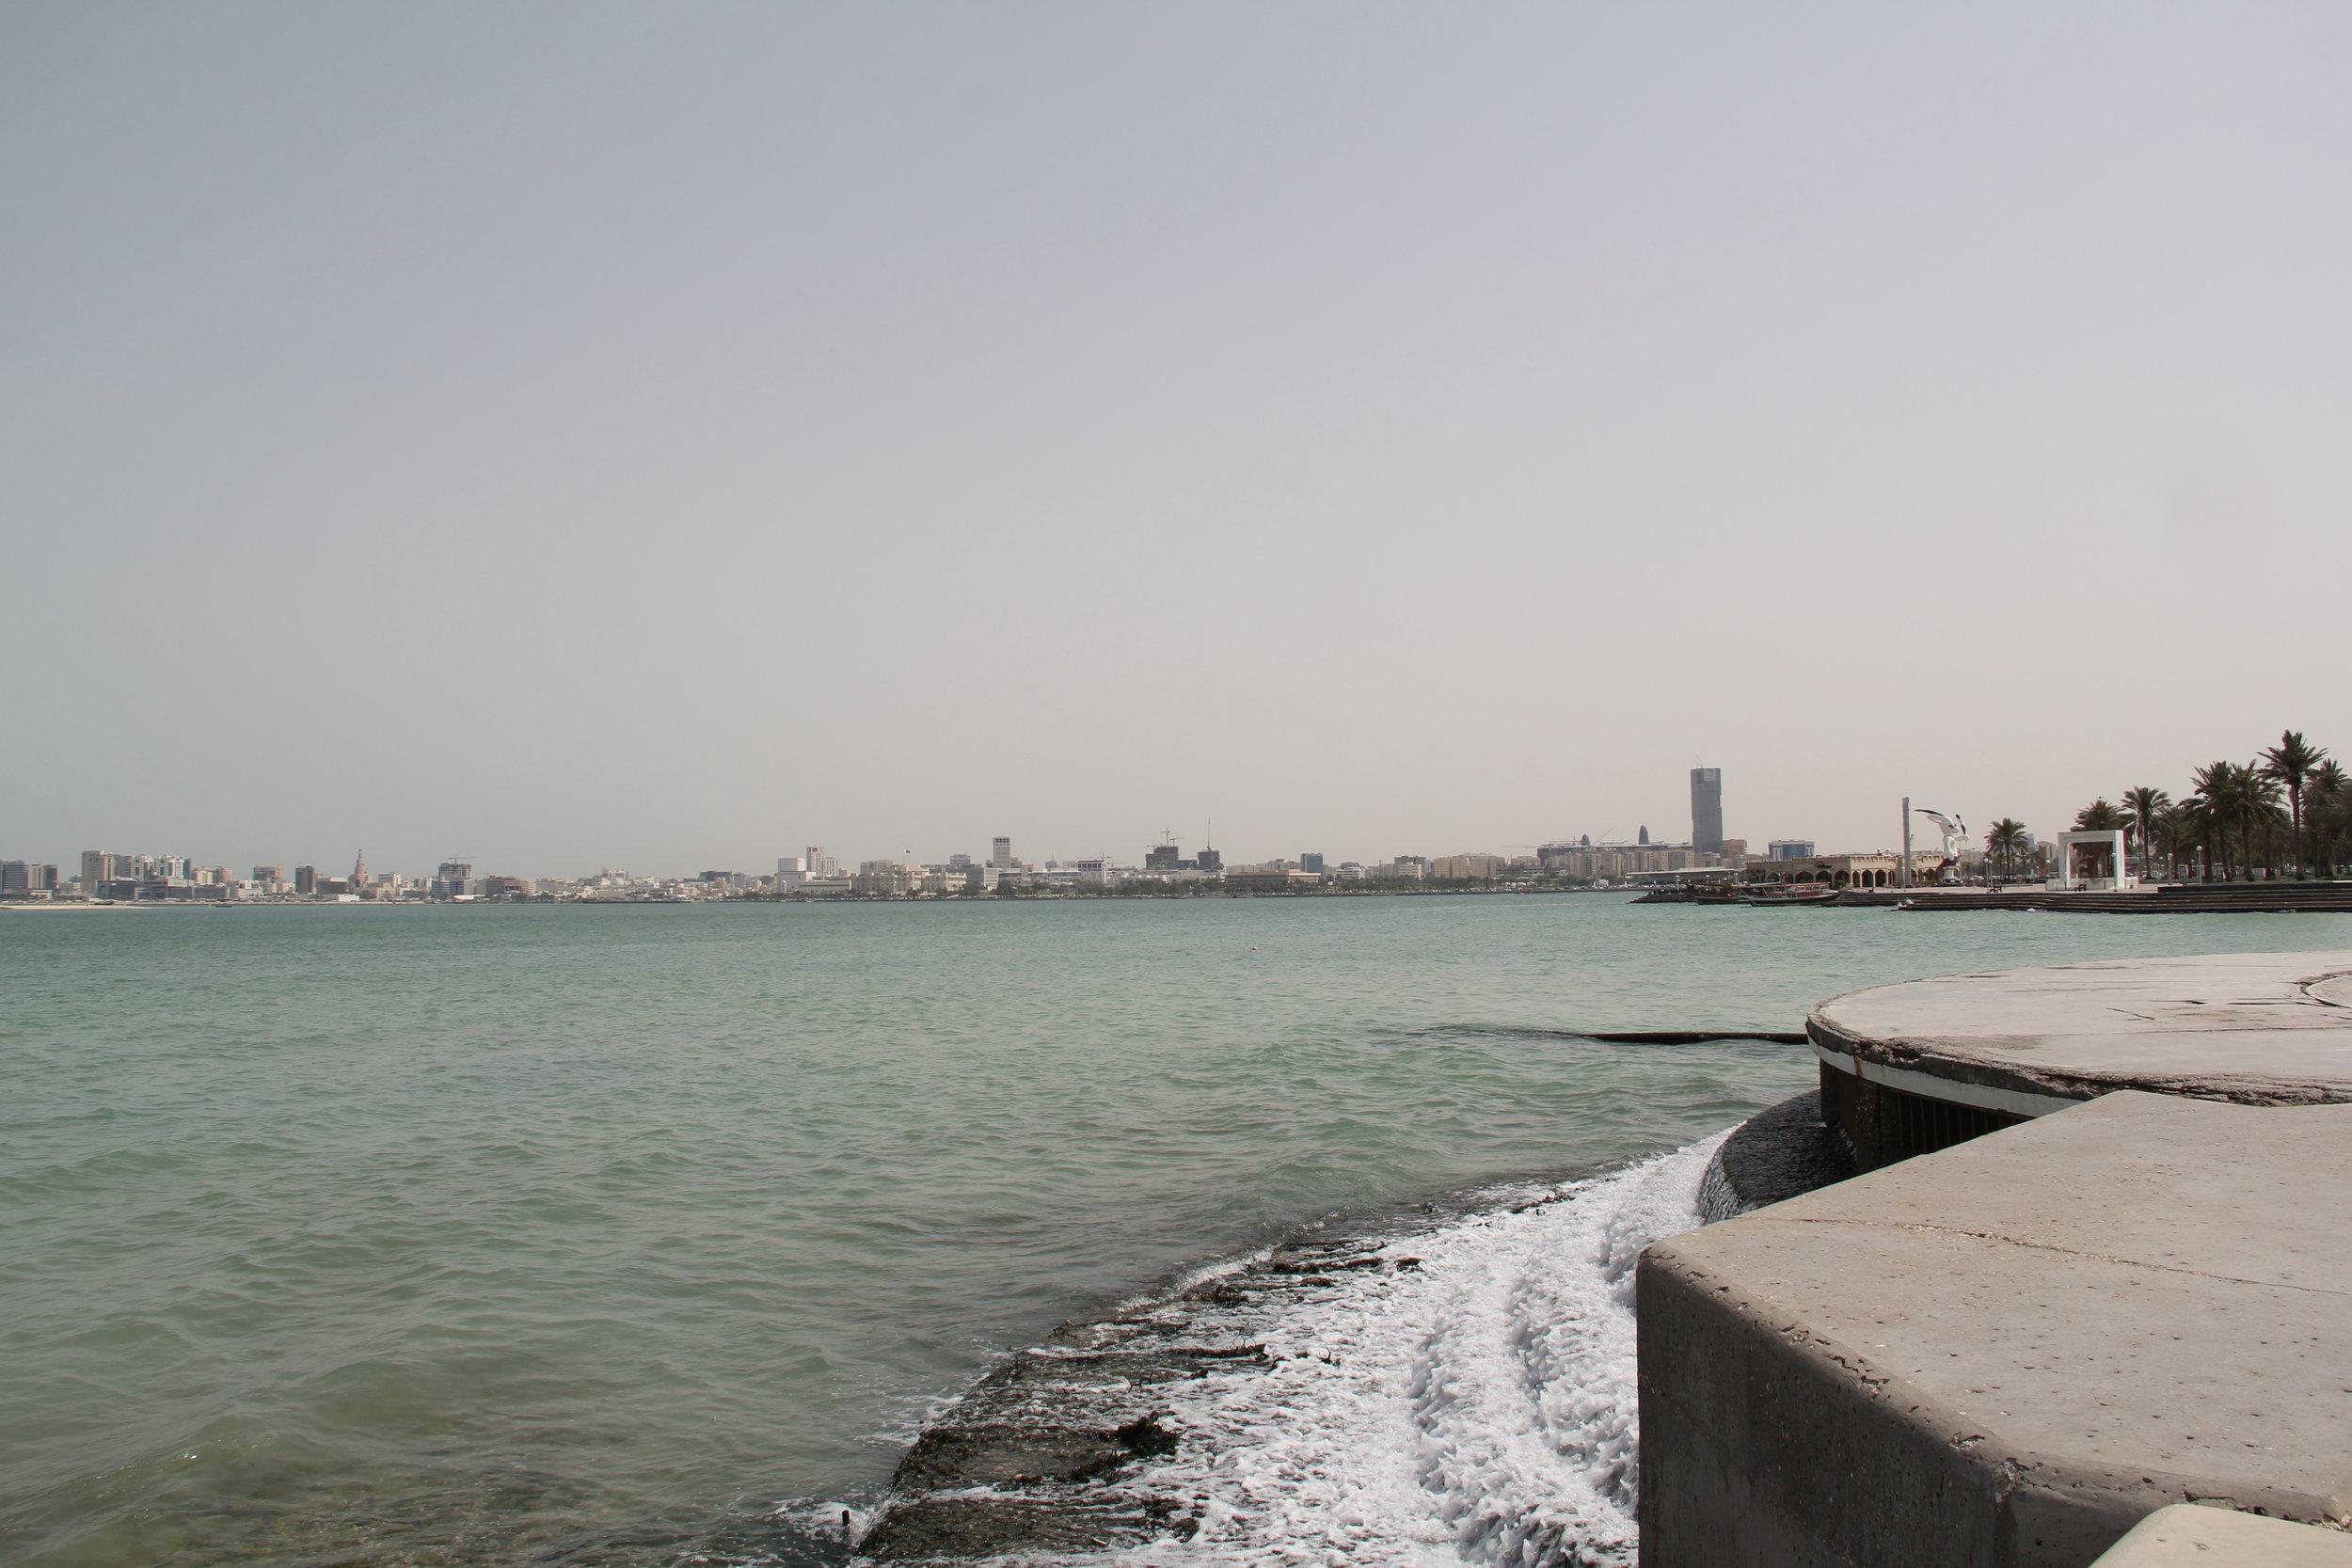 Al Corniche, Doha, Qatar. Taken by: Tyanna LC